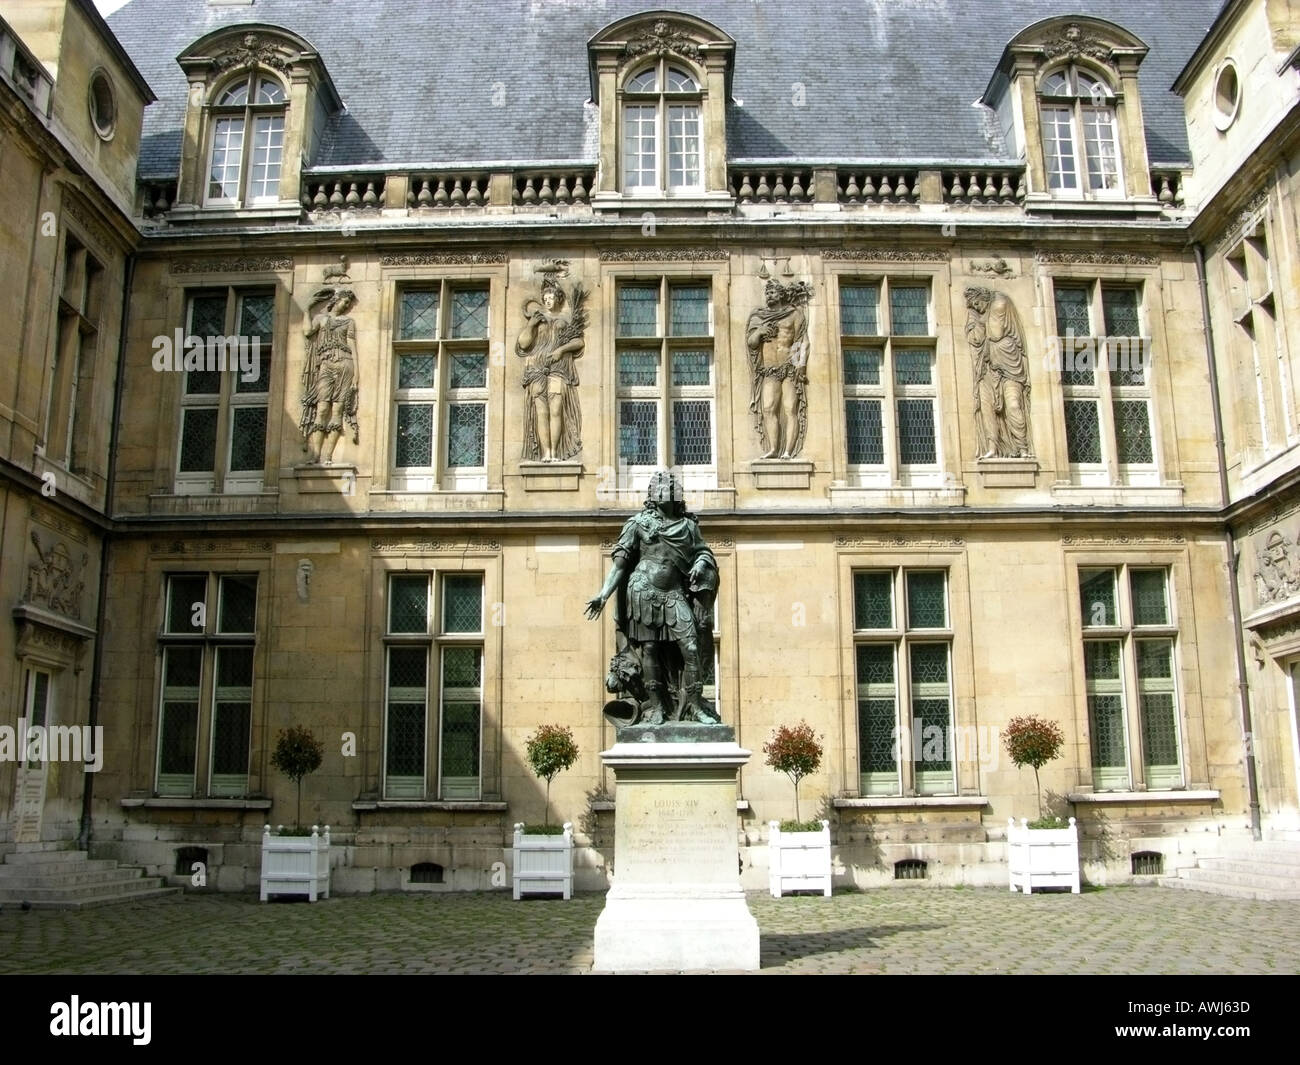 france paris Musee Carnavalet exterior of Renaissance Hotel Carnavalet courtyard - Stock Image